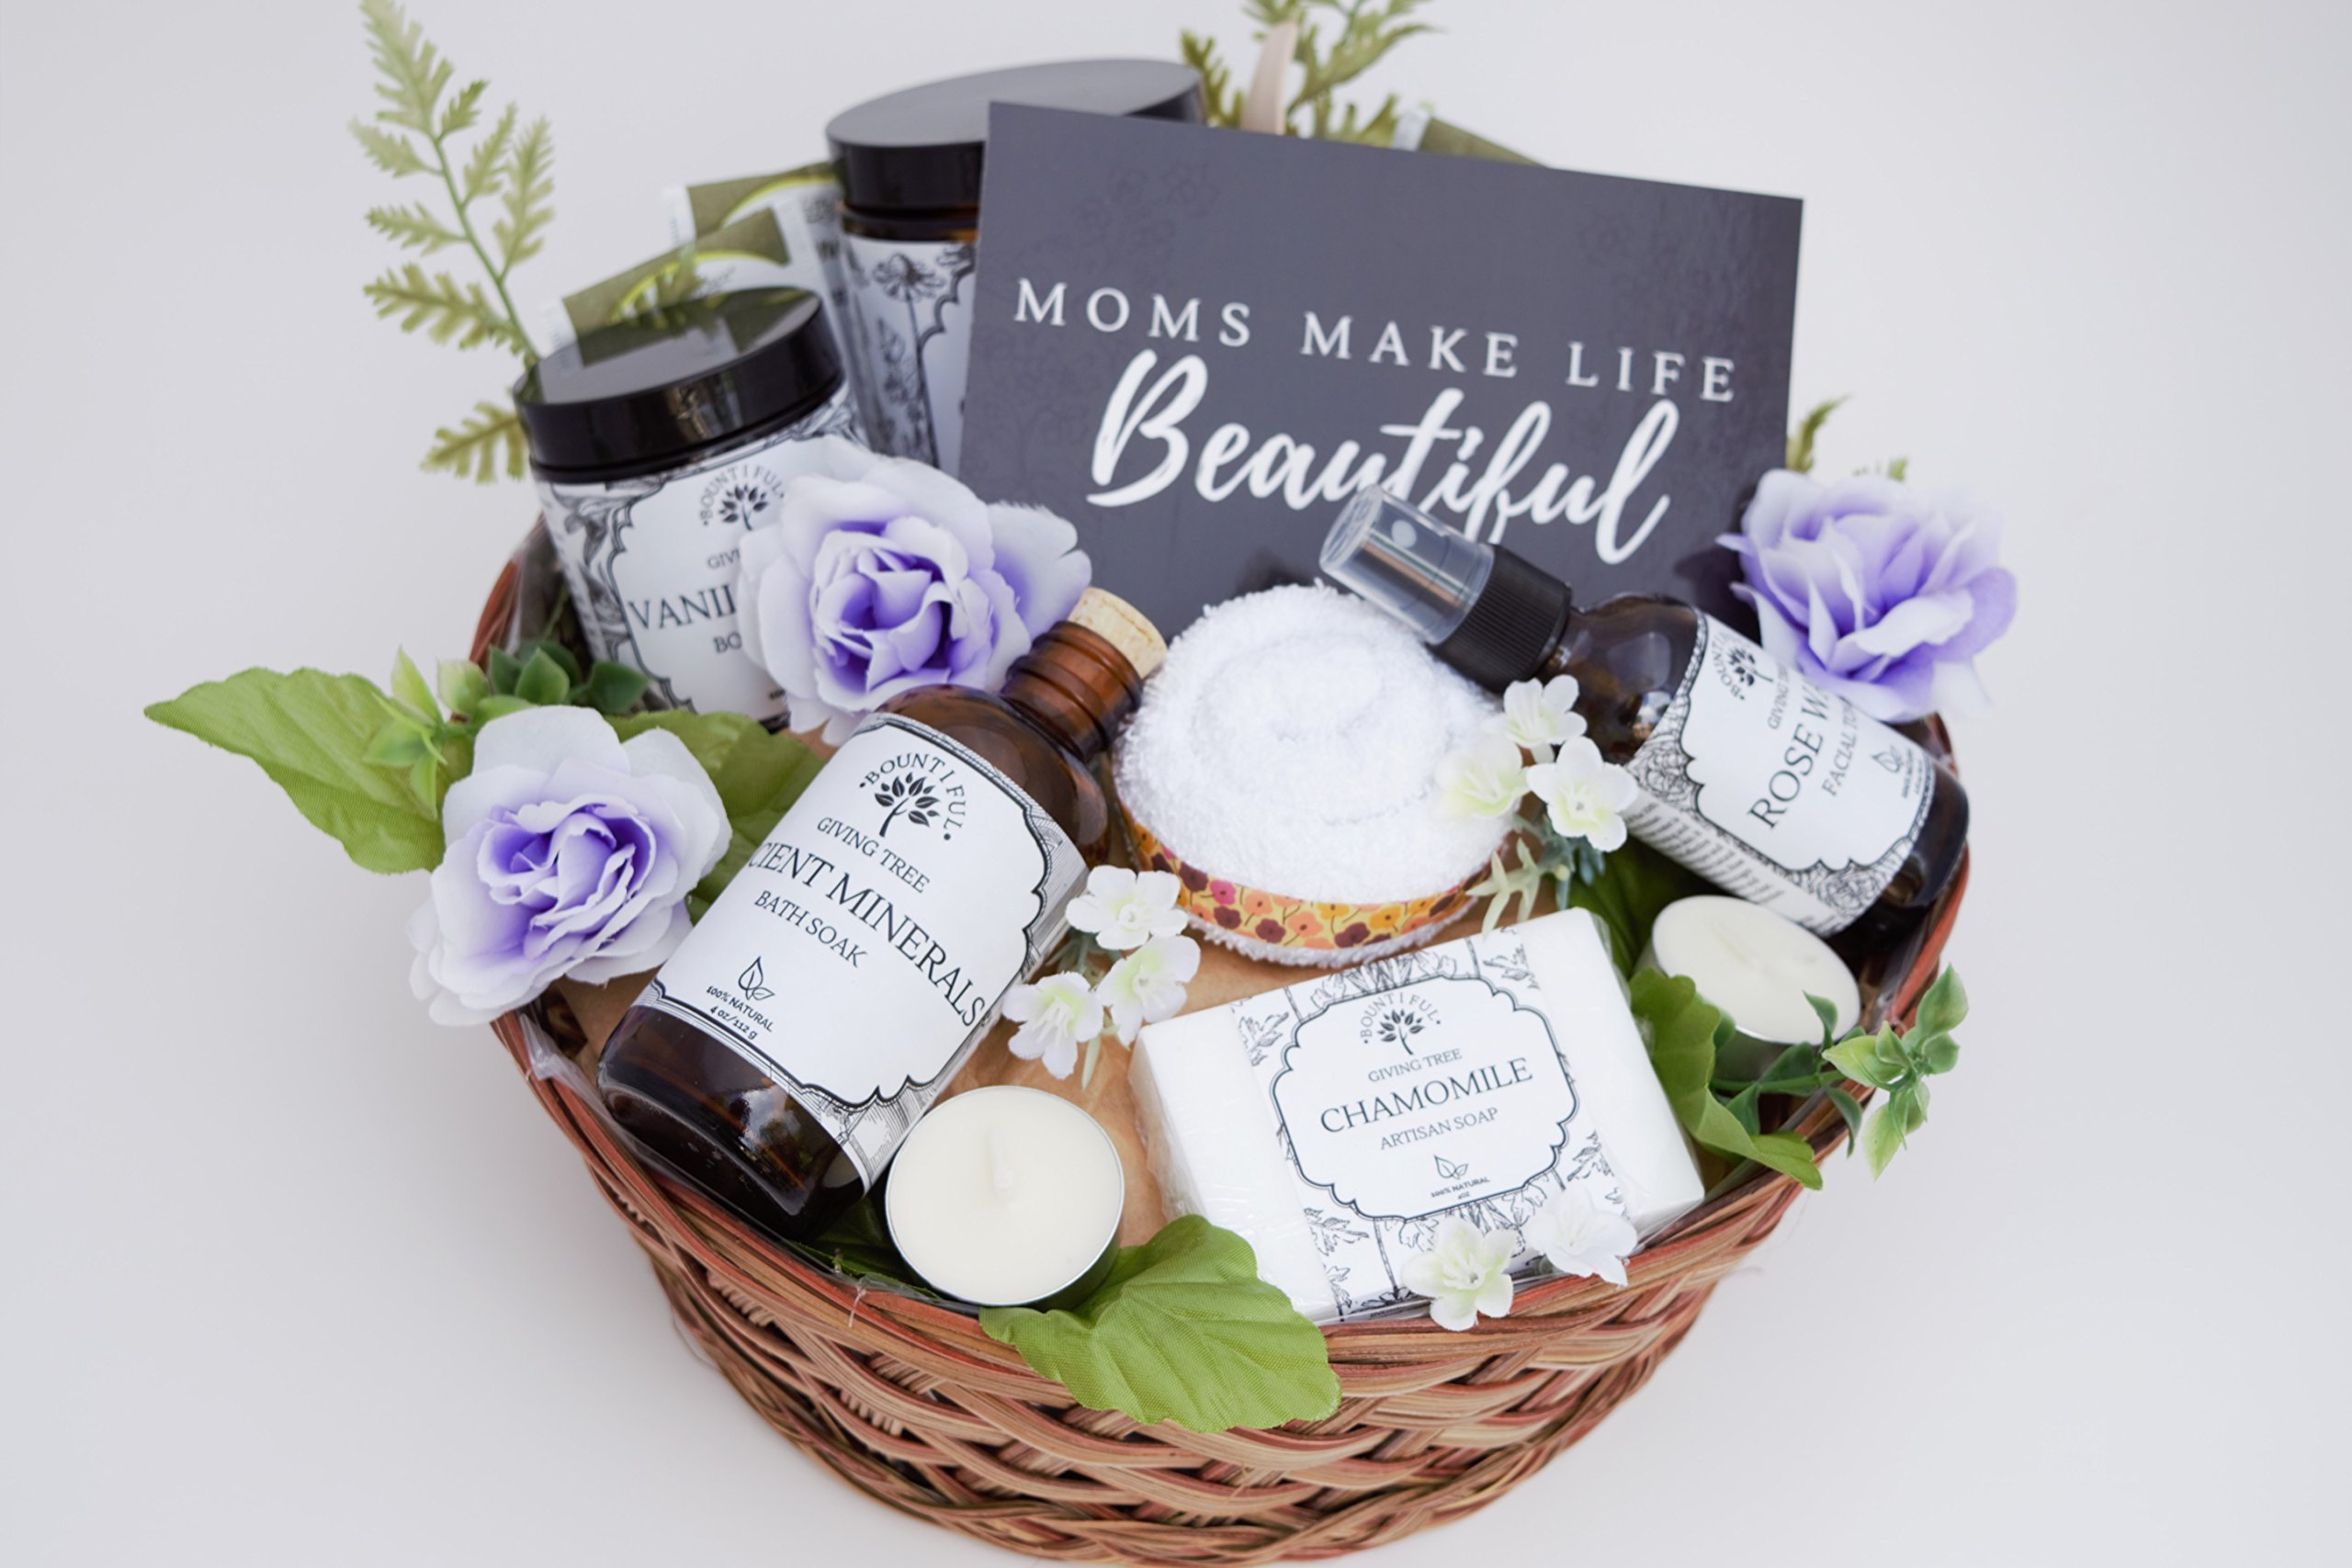 Mother Day Gift Basket, Spa Gift Basket, Includes Bath Salts, Body Butter, Rose Water, Artisan Soap Bar, Washcloth, Candles, Clay Mask, Sugar Scrub, Handwritten Card